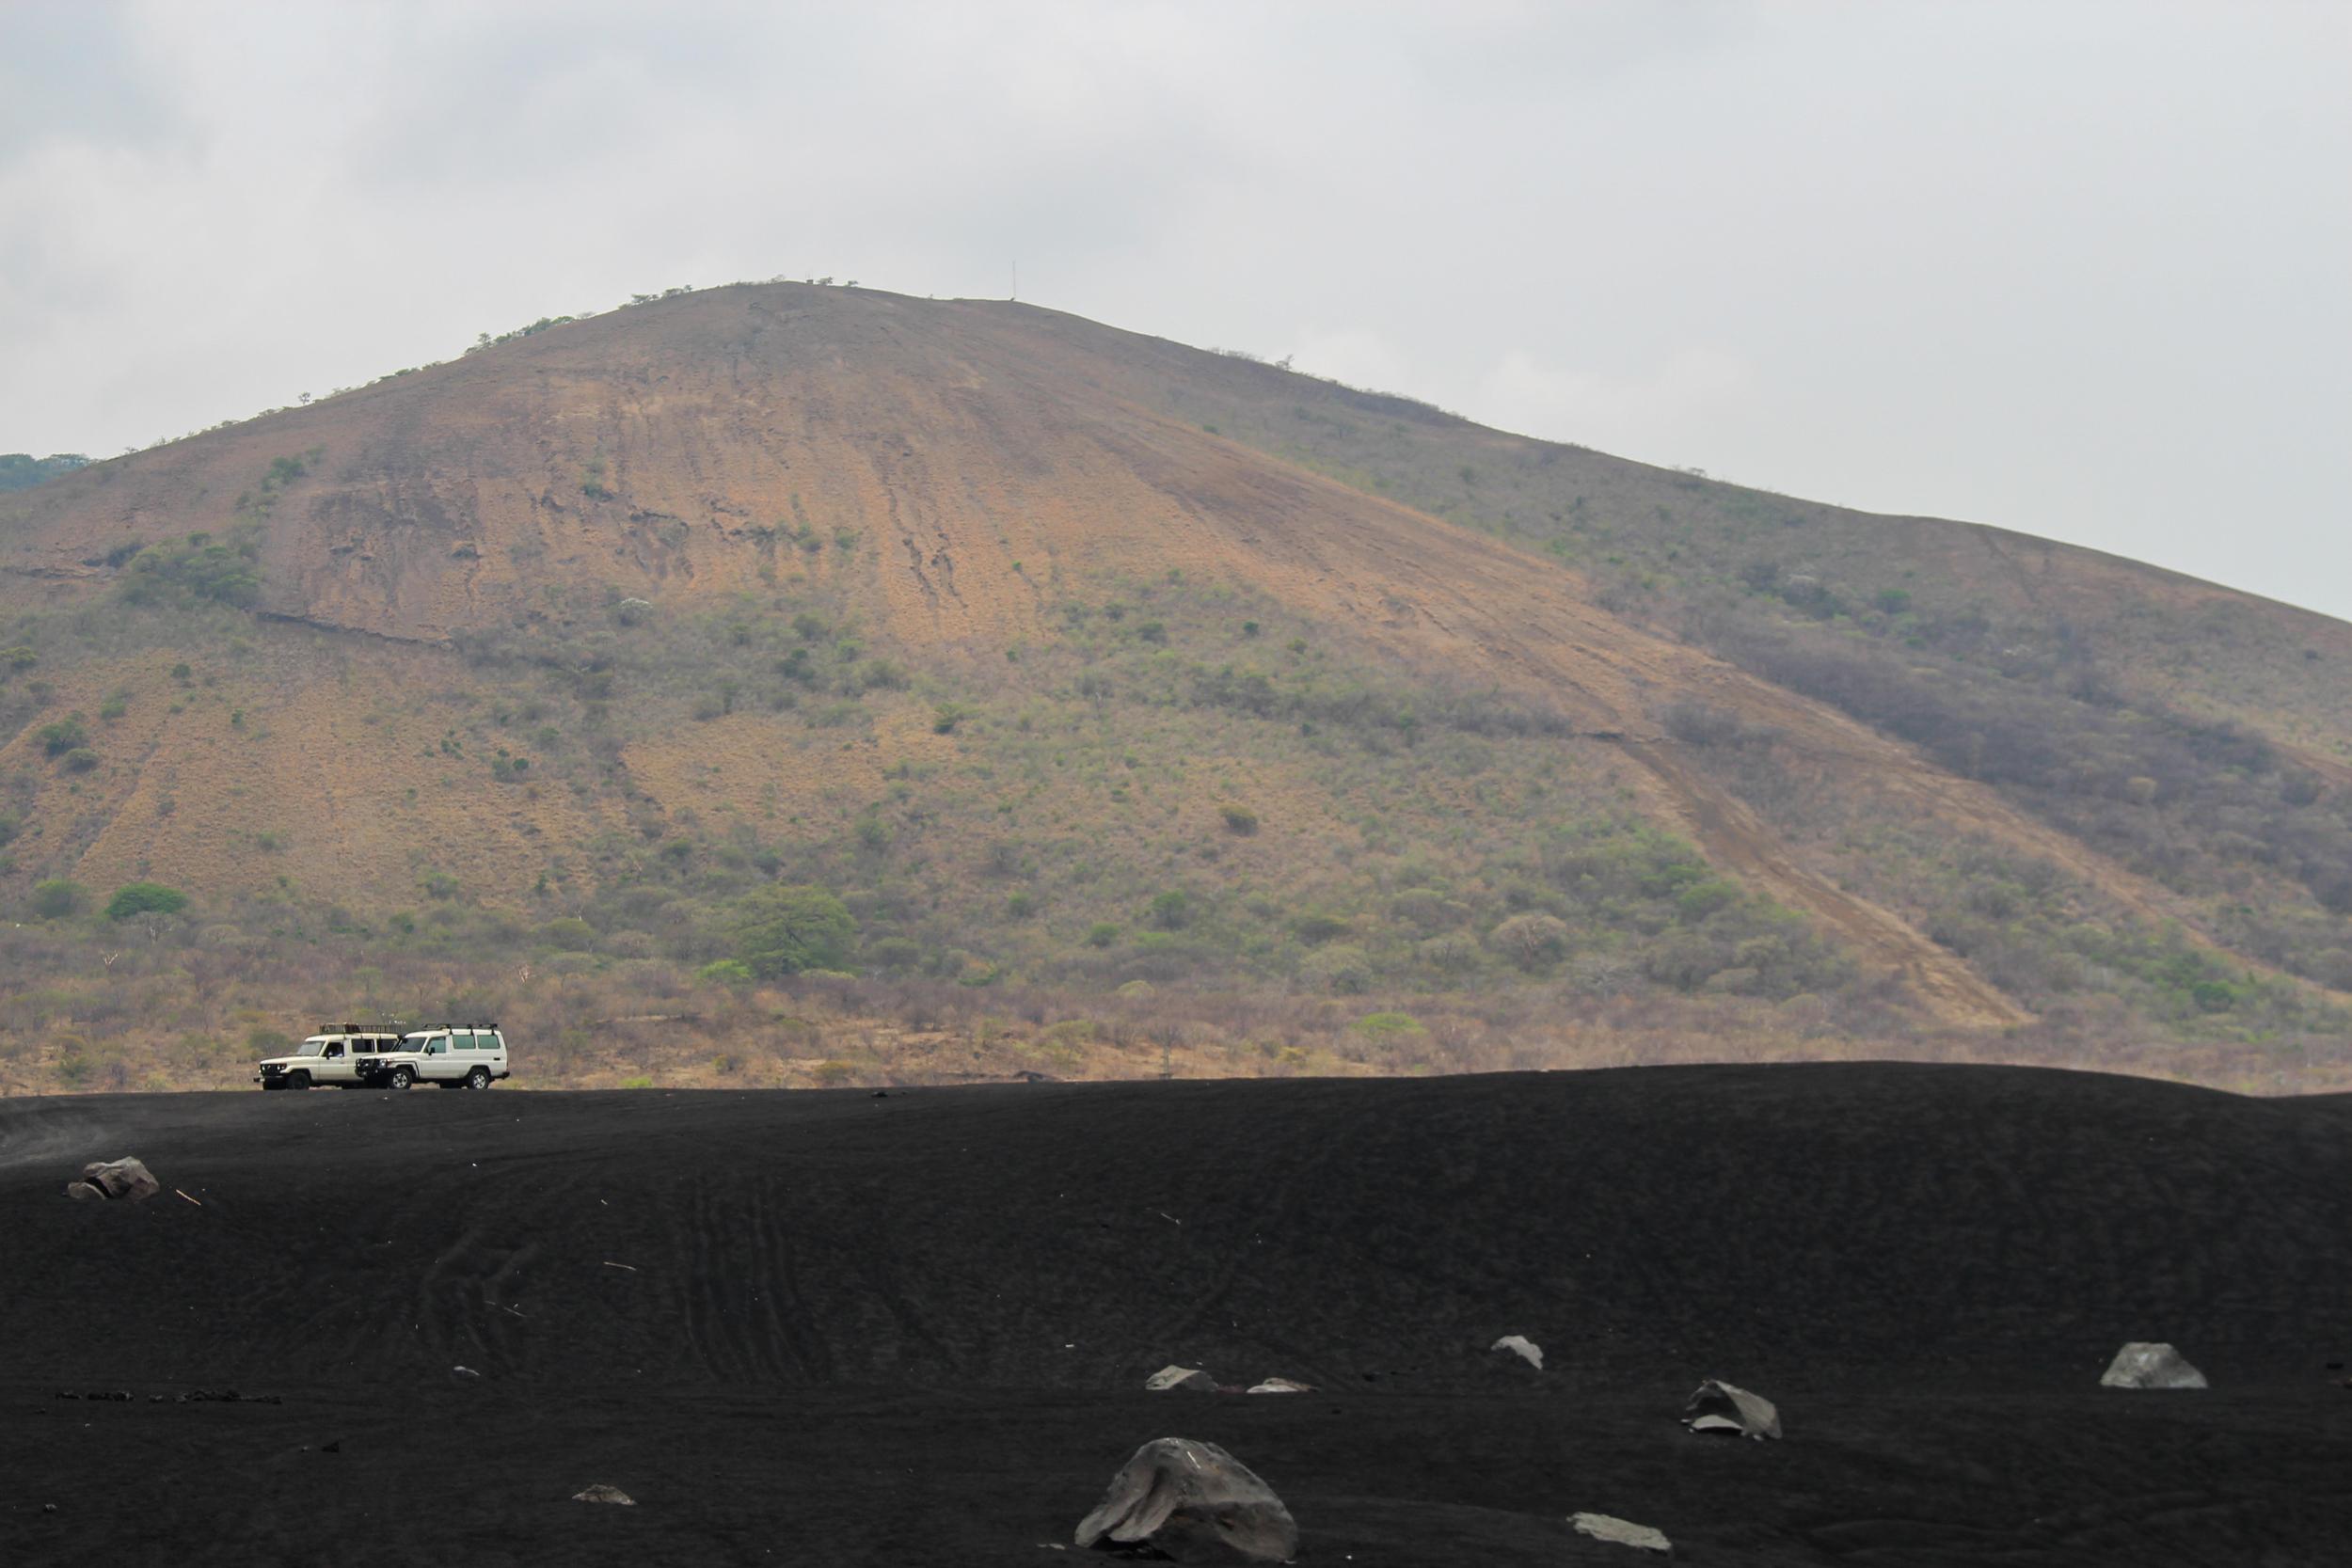 The black rocks of Cerro Negro volcano